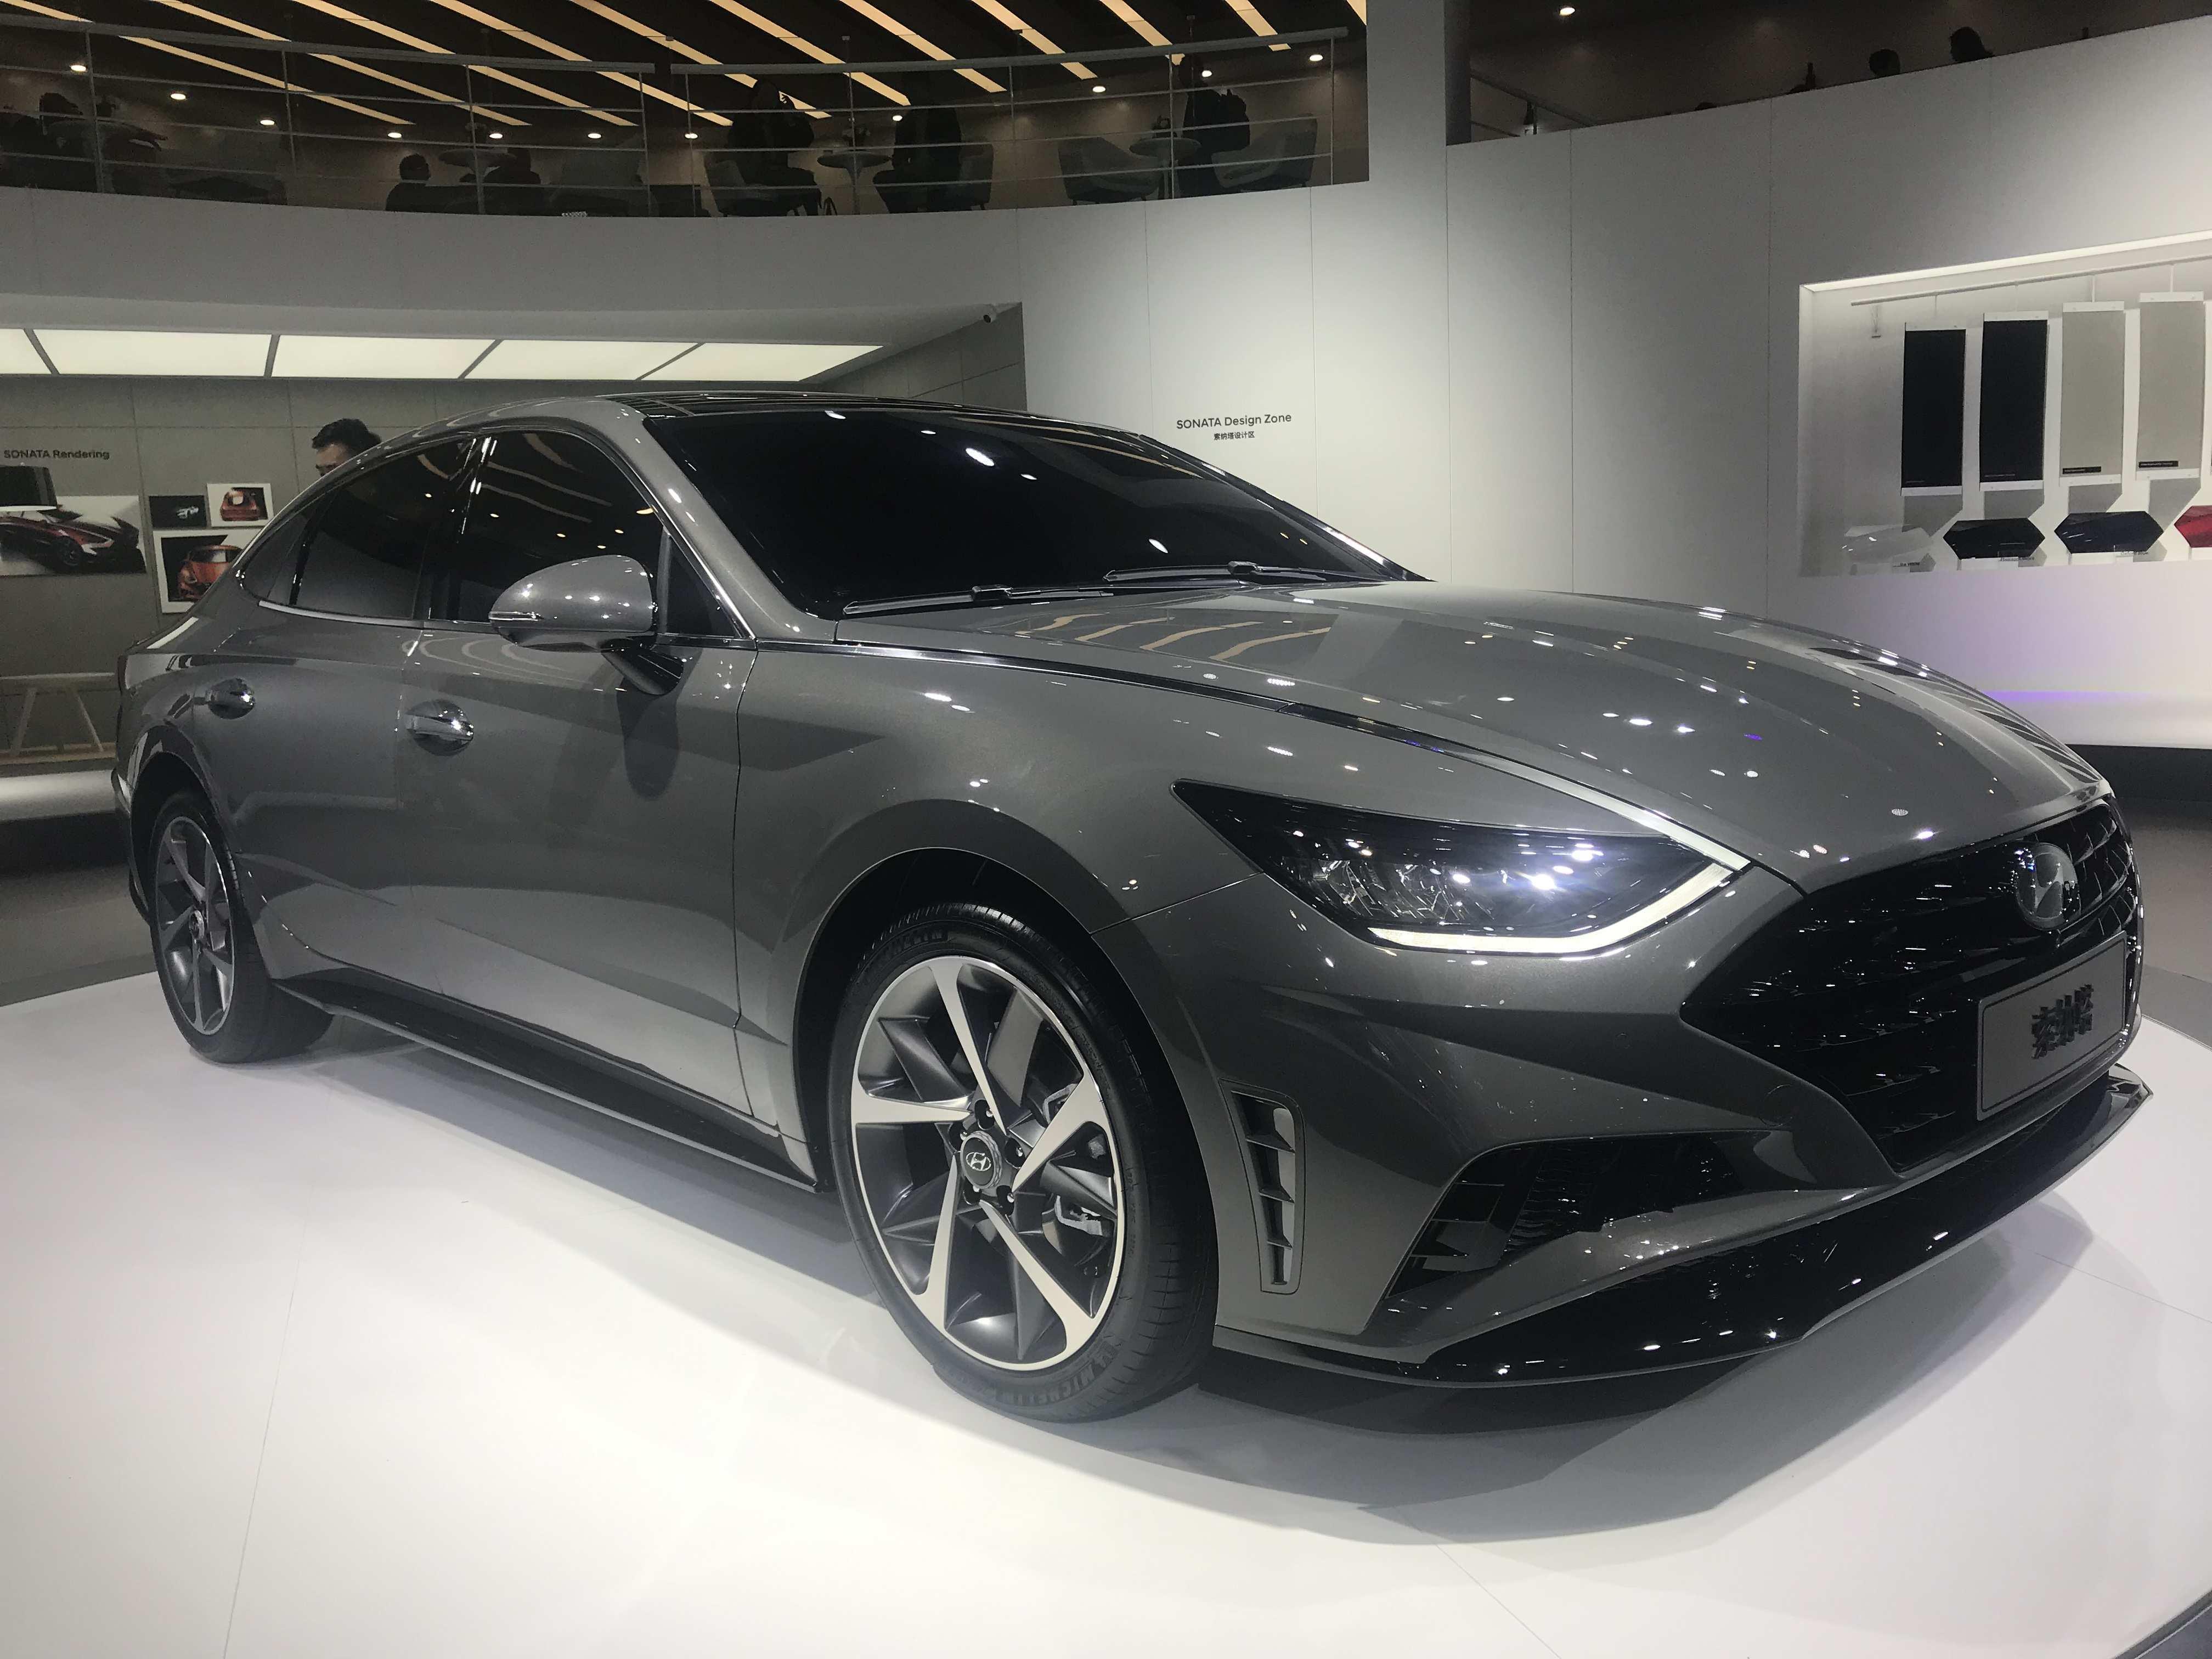 38 Gallery of Hyundai Grandeur 2020 Specs by Hyundai Grandeur 2020